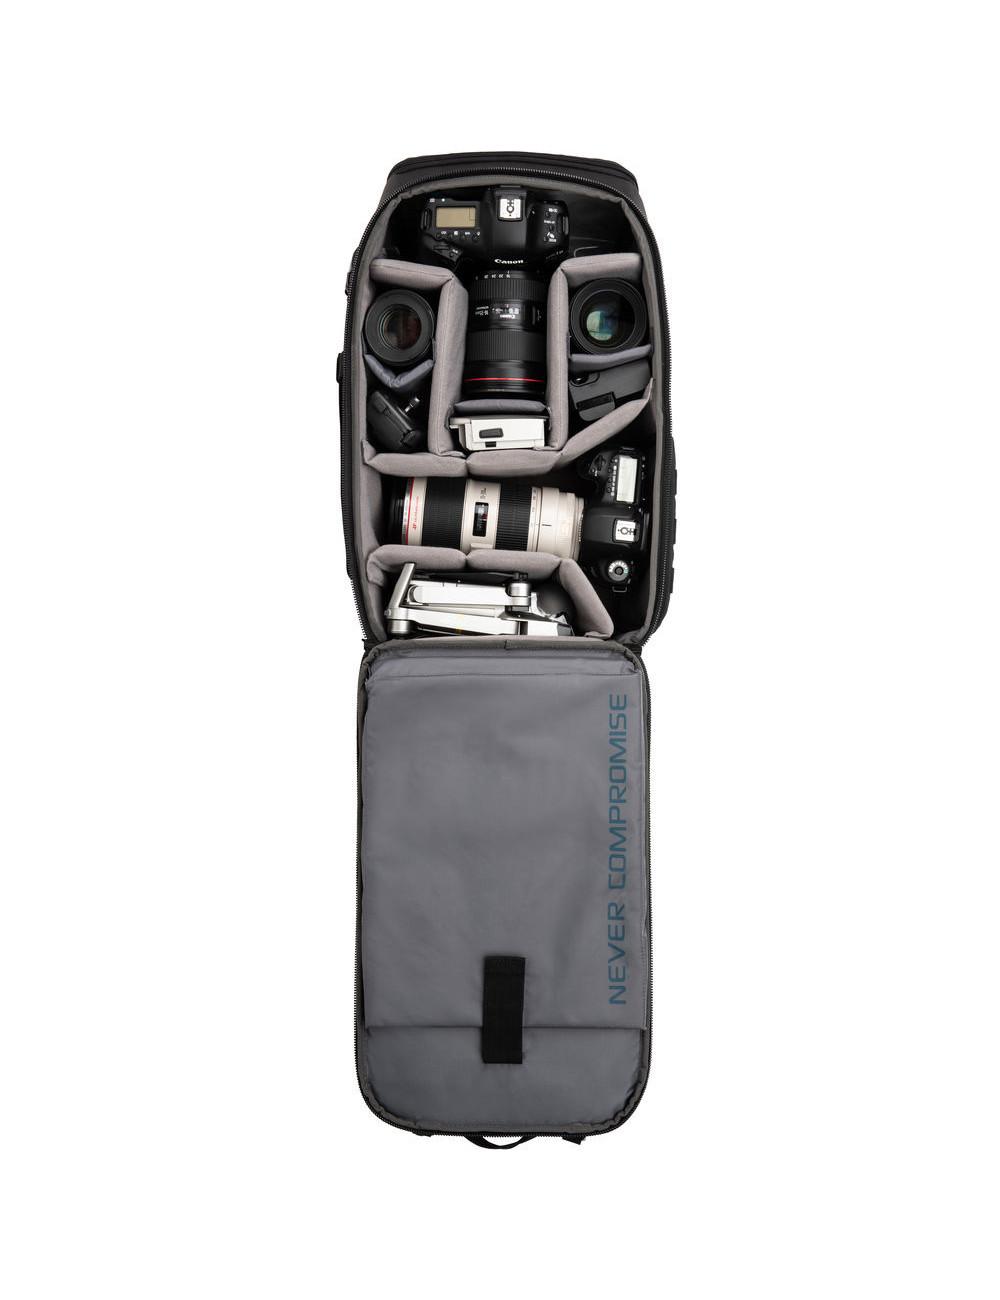 Boya BY-WXLR8 Transmisor XLR inalámbrico para Micrófonos compatible con BY-wm6 y wm8